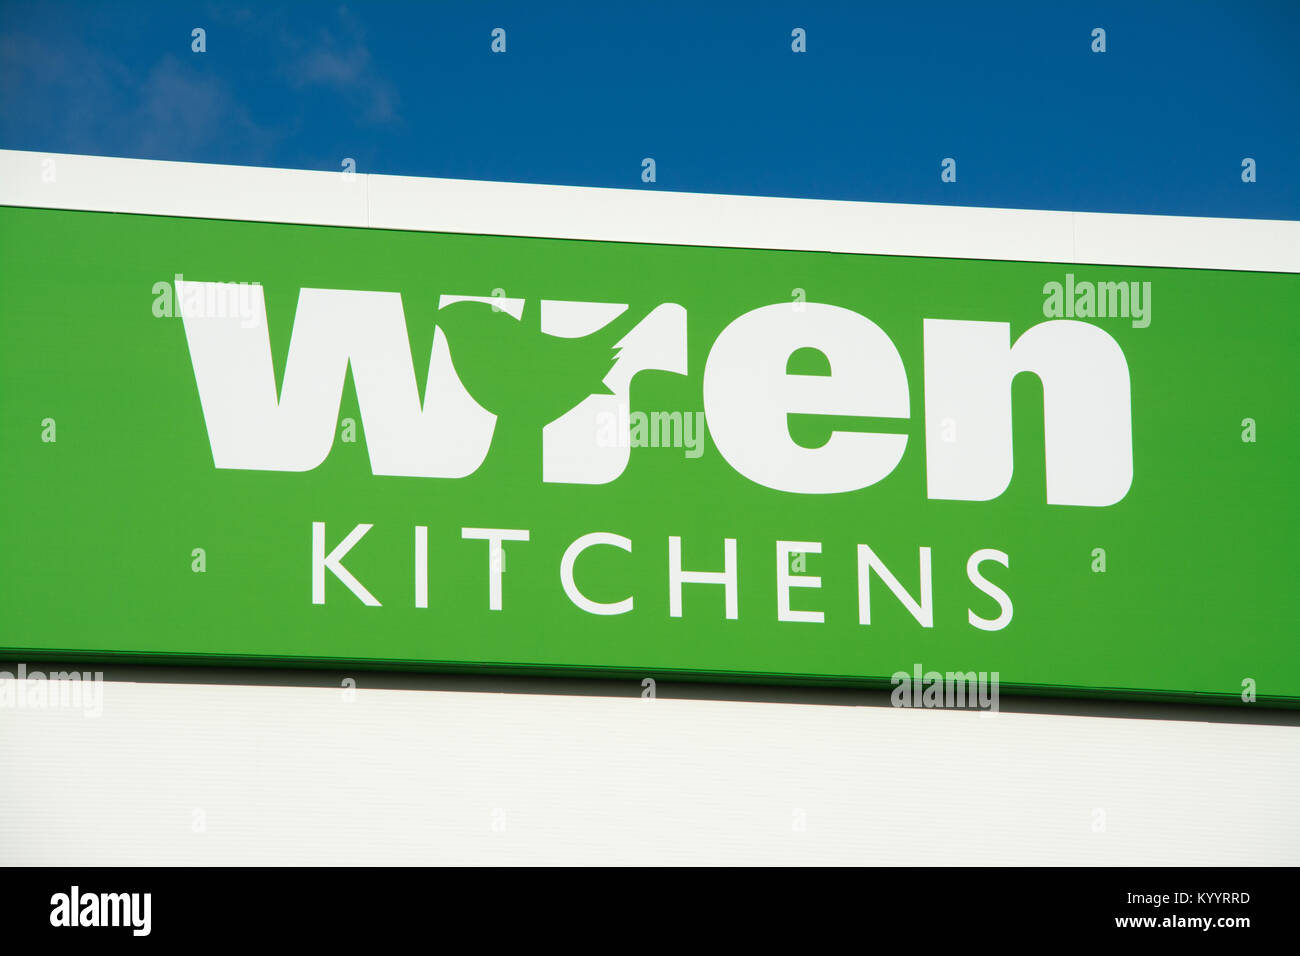 Wren kitchens shop signage or sign, UK - Stock Image